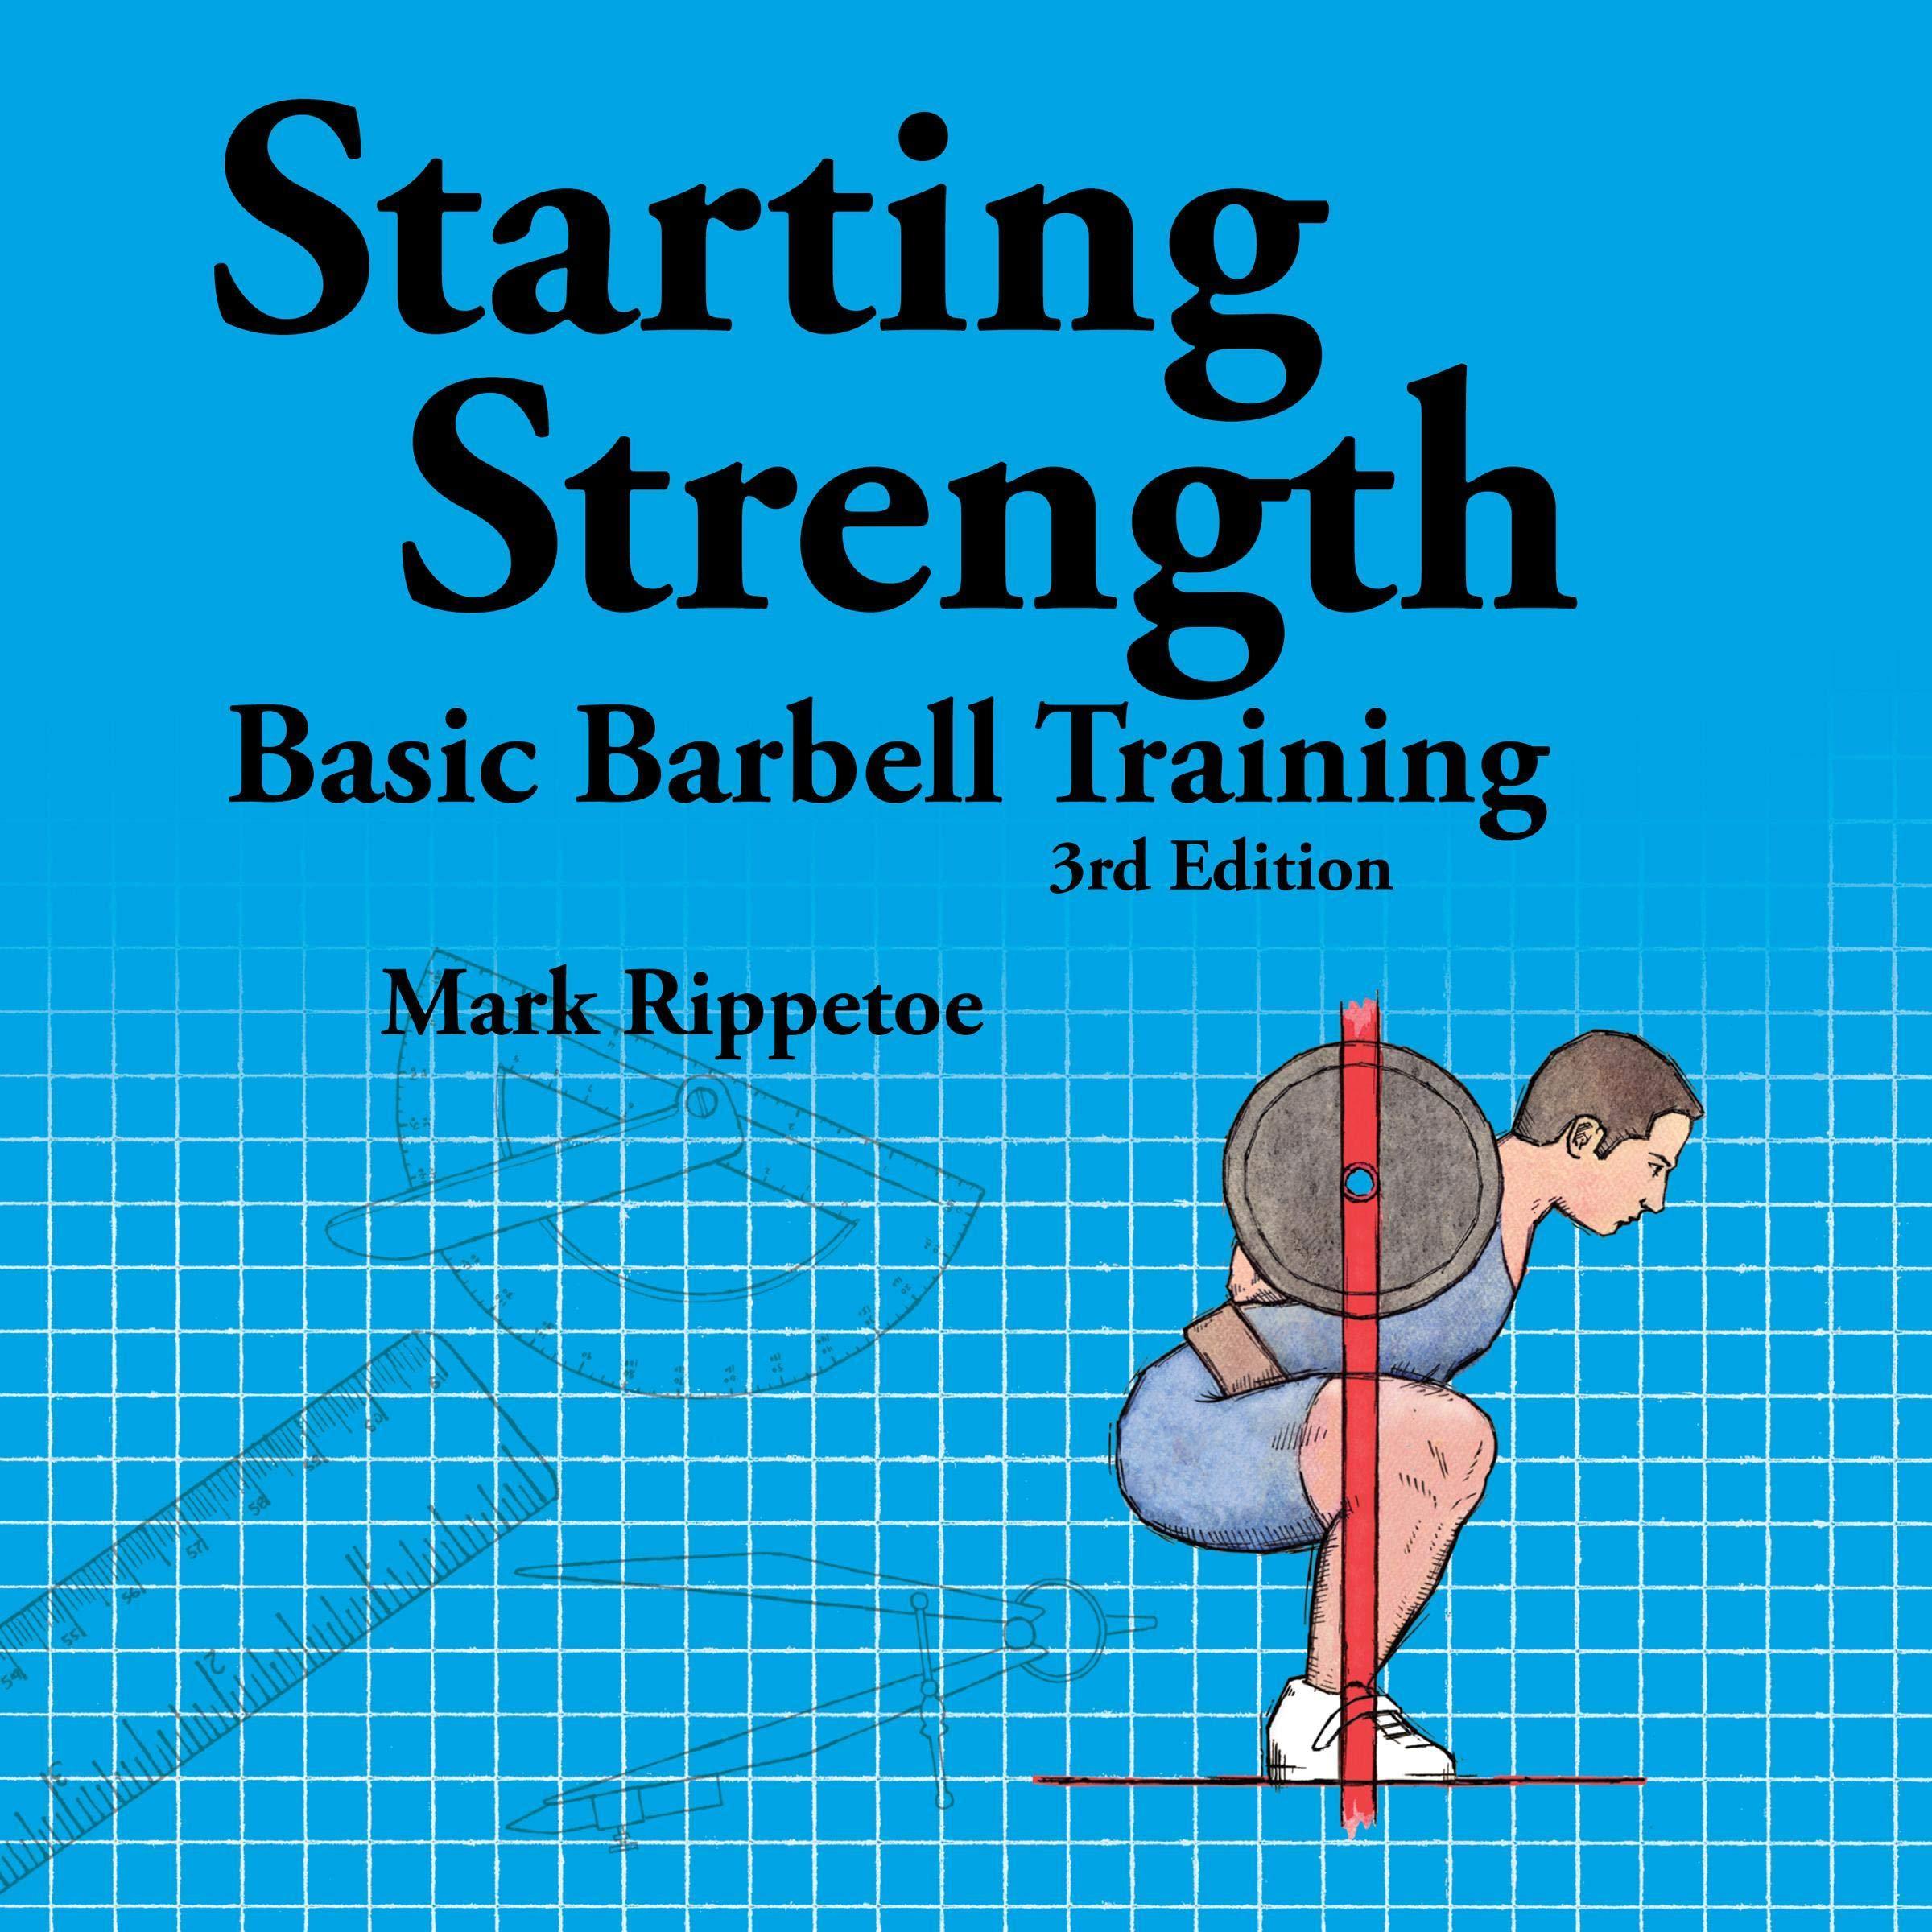 Starting Strength  Basic Barbell Training 3rd Edition